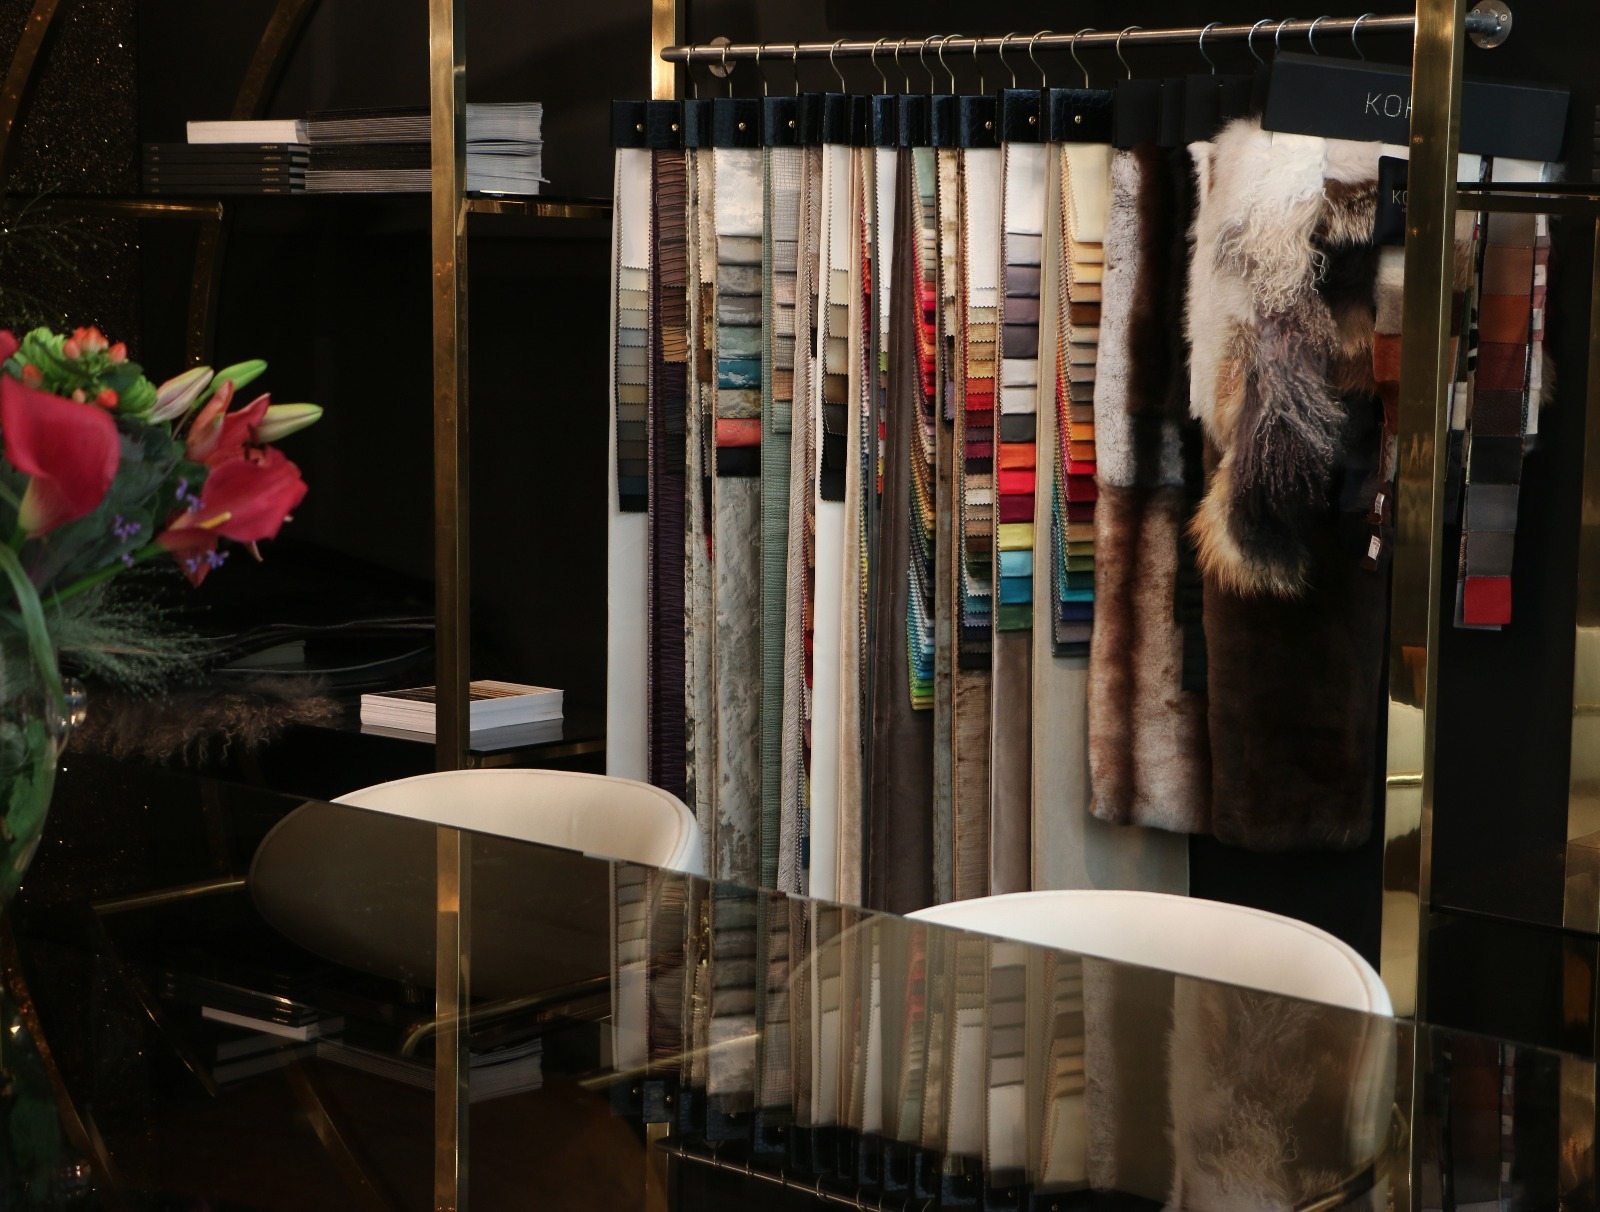 KOKET Fabric collection at Decorex  decorex international 2016 Get Inside Decorex International 2016: Take the First Look Get Inside Decorex International 2016 Take the First Look 2